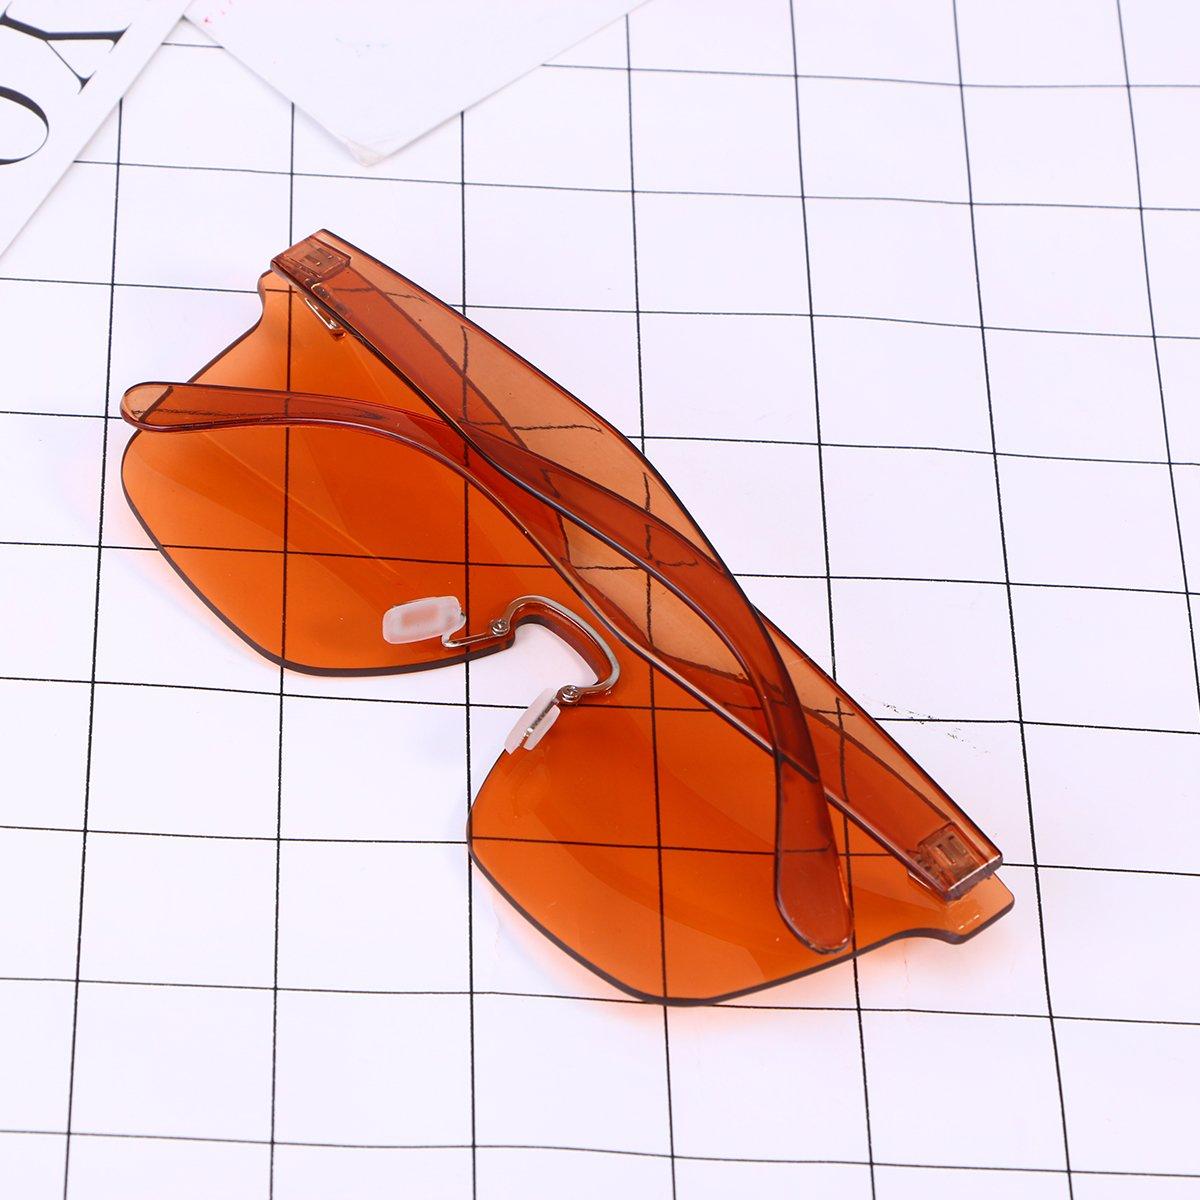 797af81f4498 OULII Rimless Sunglasses Novelty Pratical Beach Seaside Sunglass Mirror  Summer Eyewear for Men Women (Orange): Amazon.co.uk: Clothing